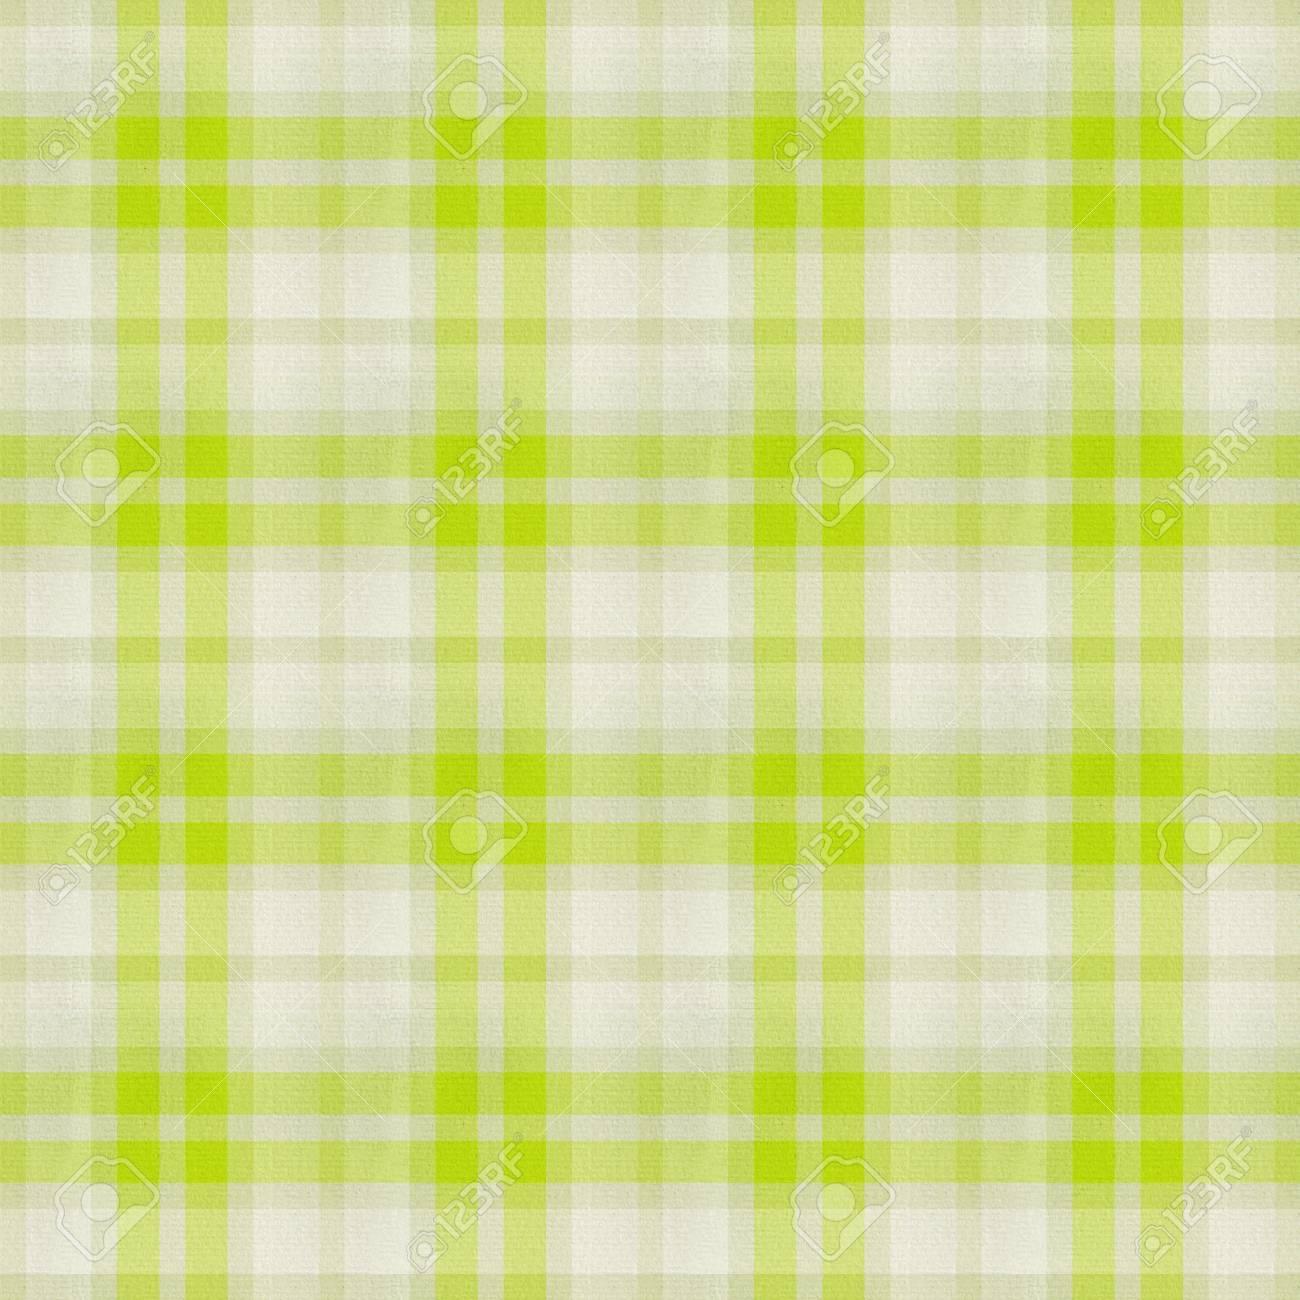 Retro - texture pattern Stock Photo - 12785706